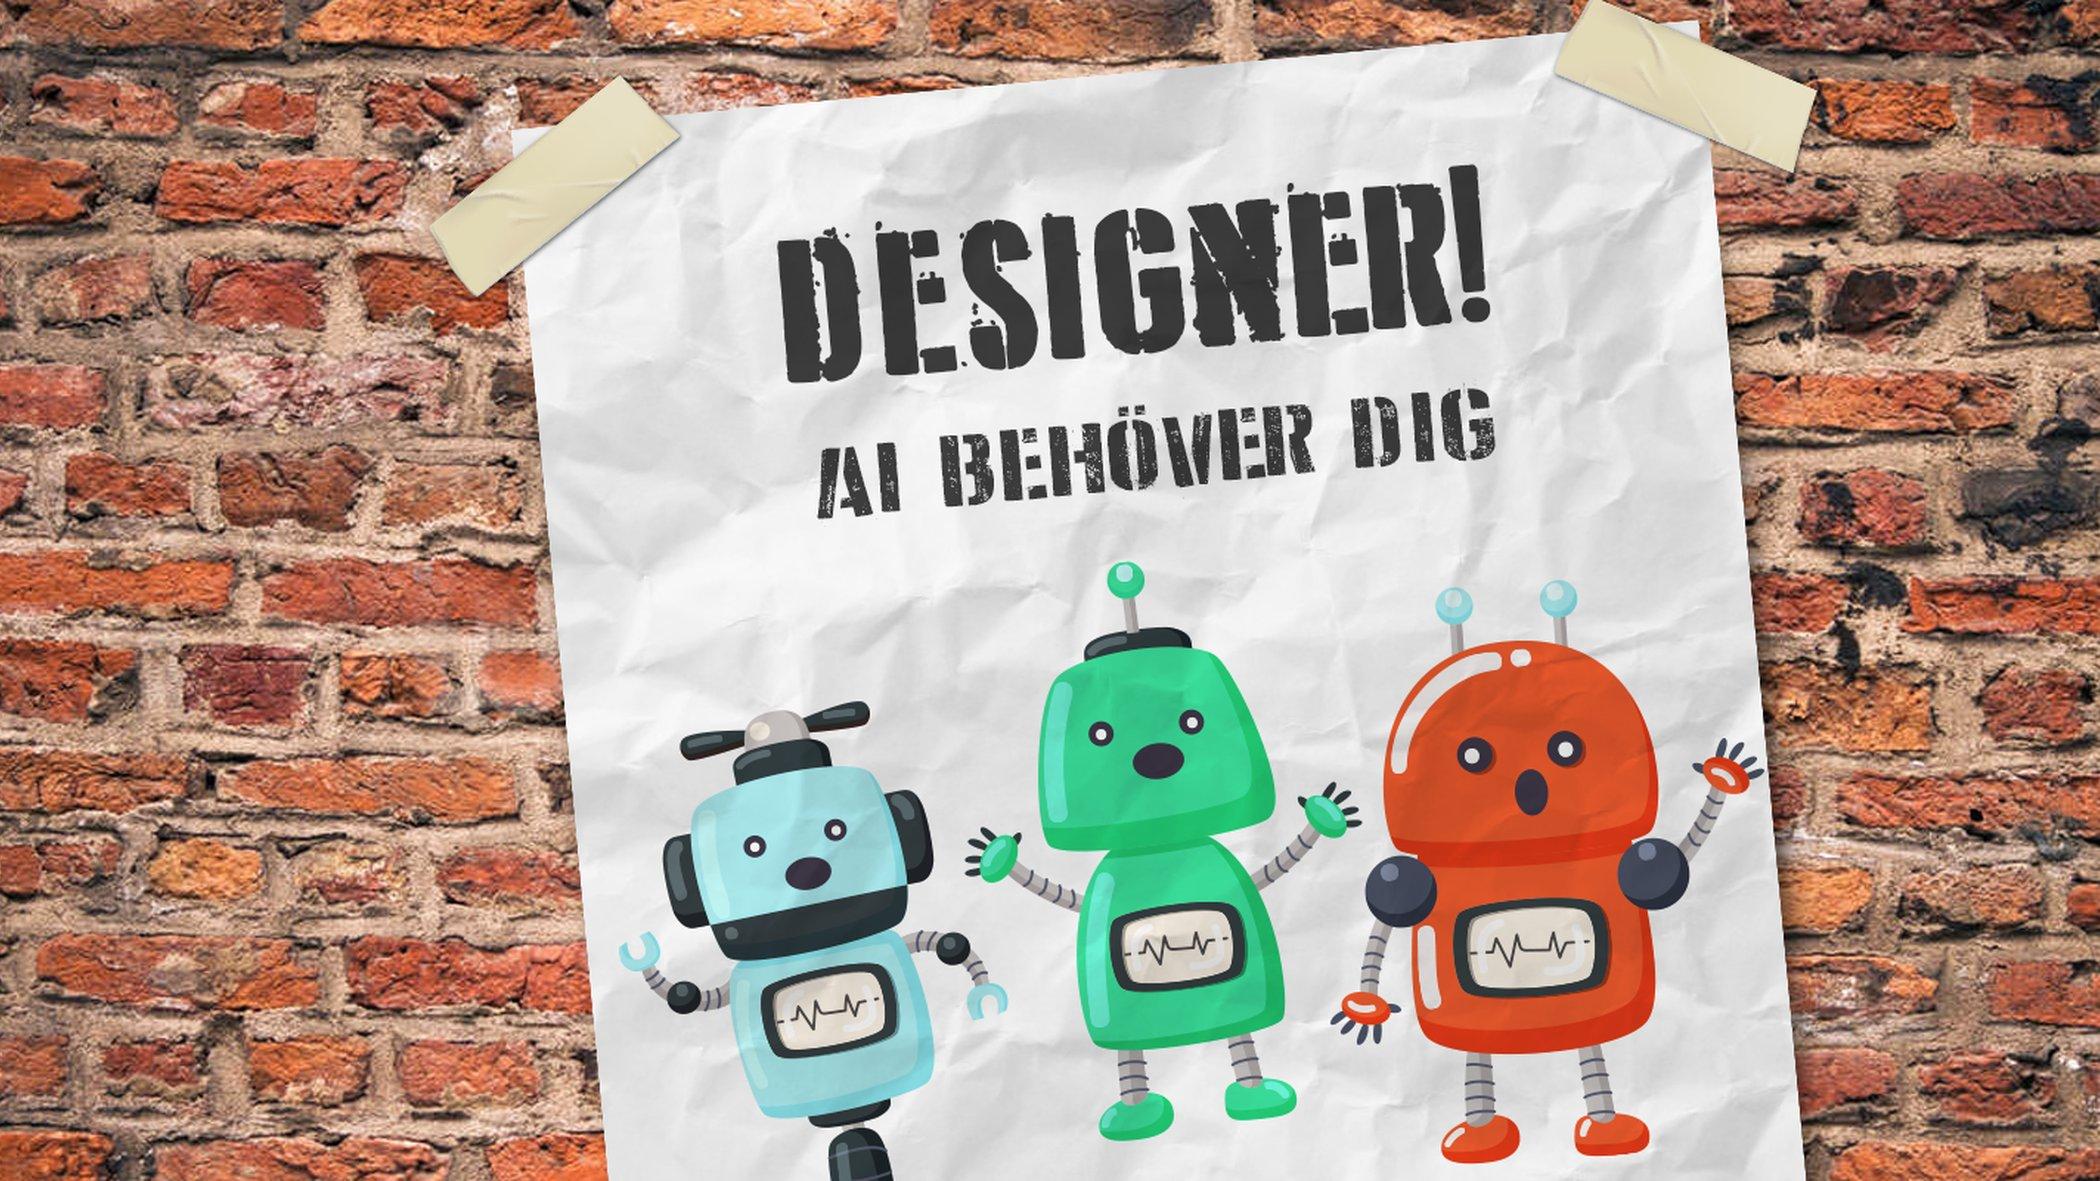 affisch med texten Designer - AI behöver dig